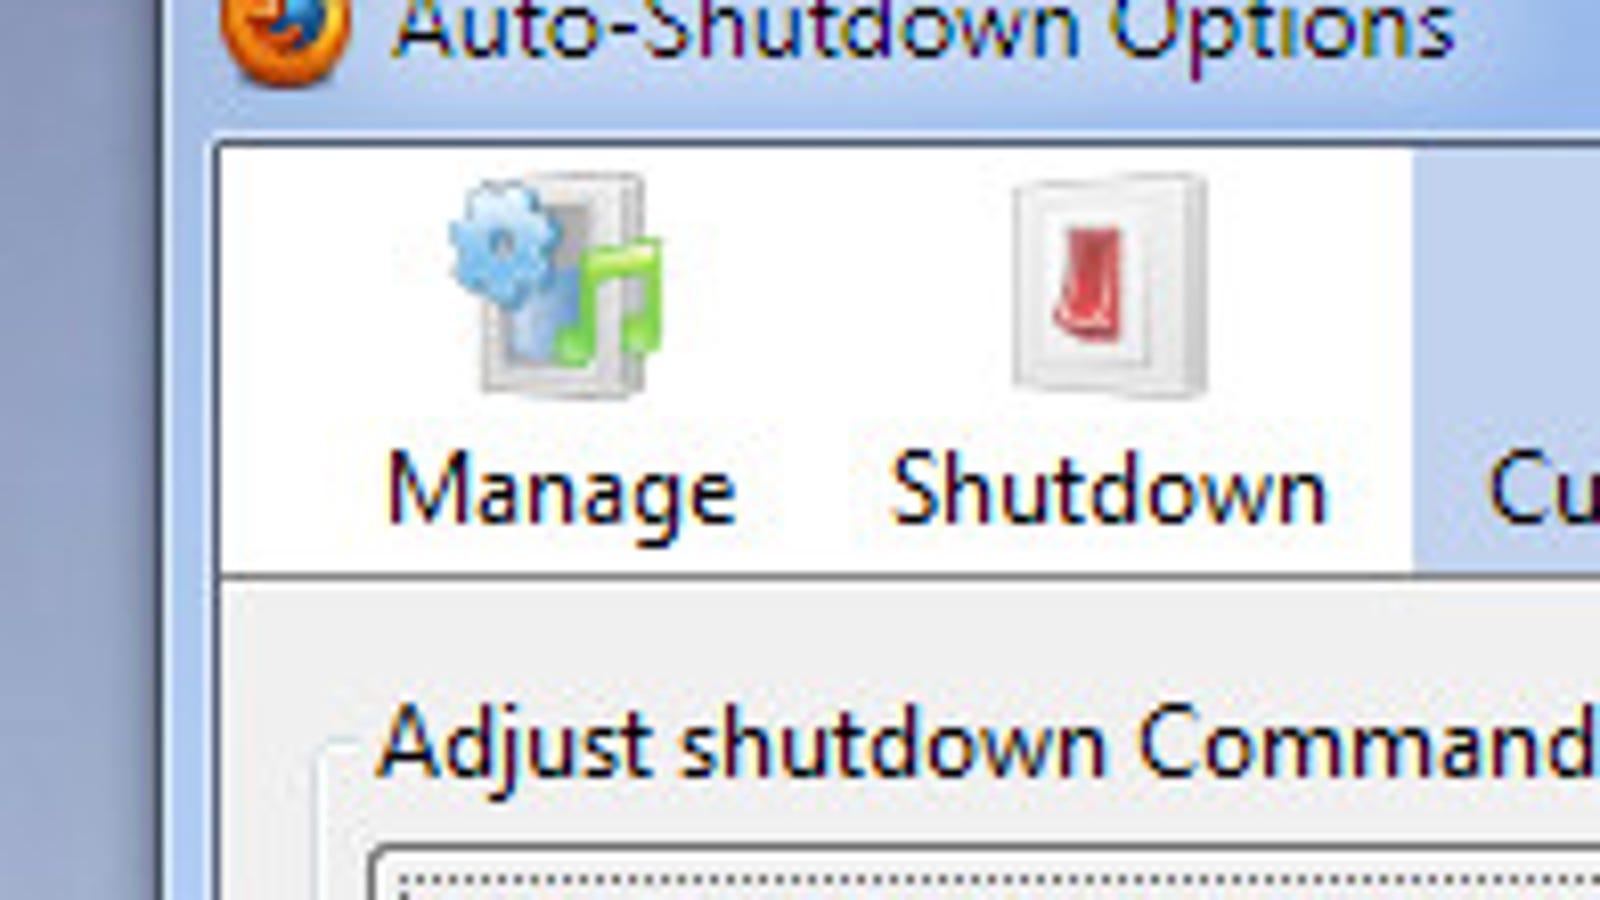 How Do I Keep Windows from Hibernating While I'm Downloading?